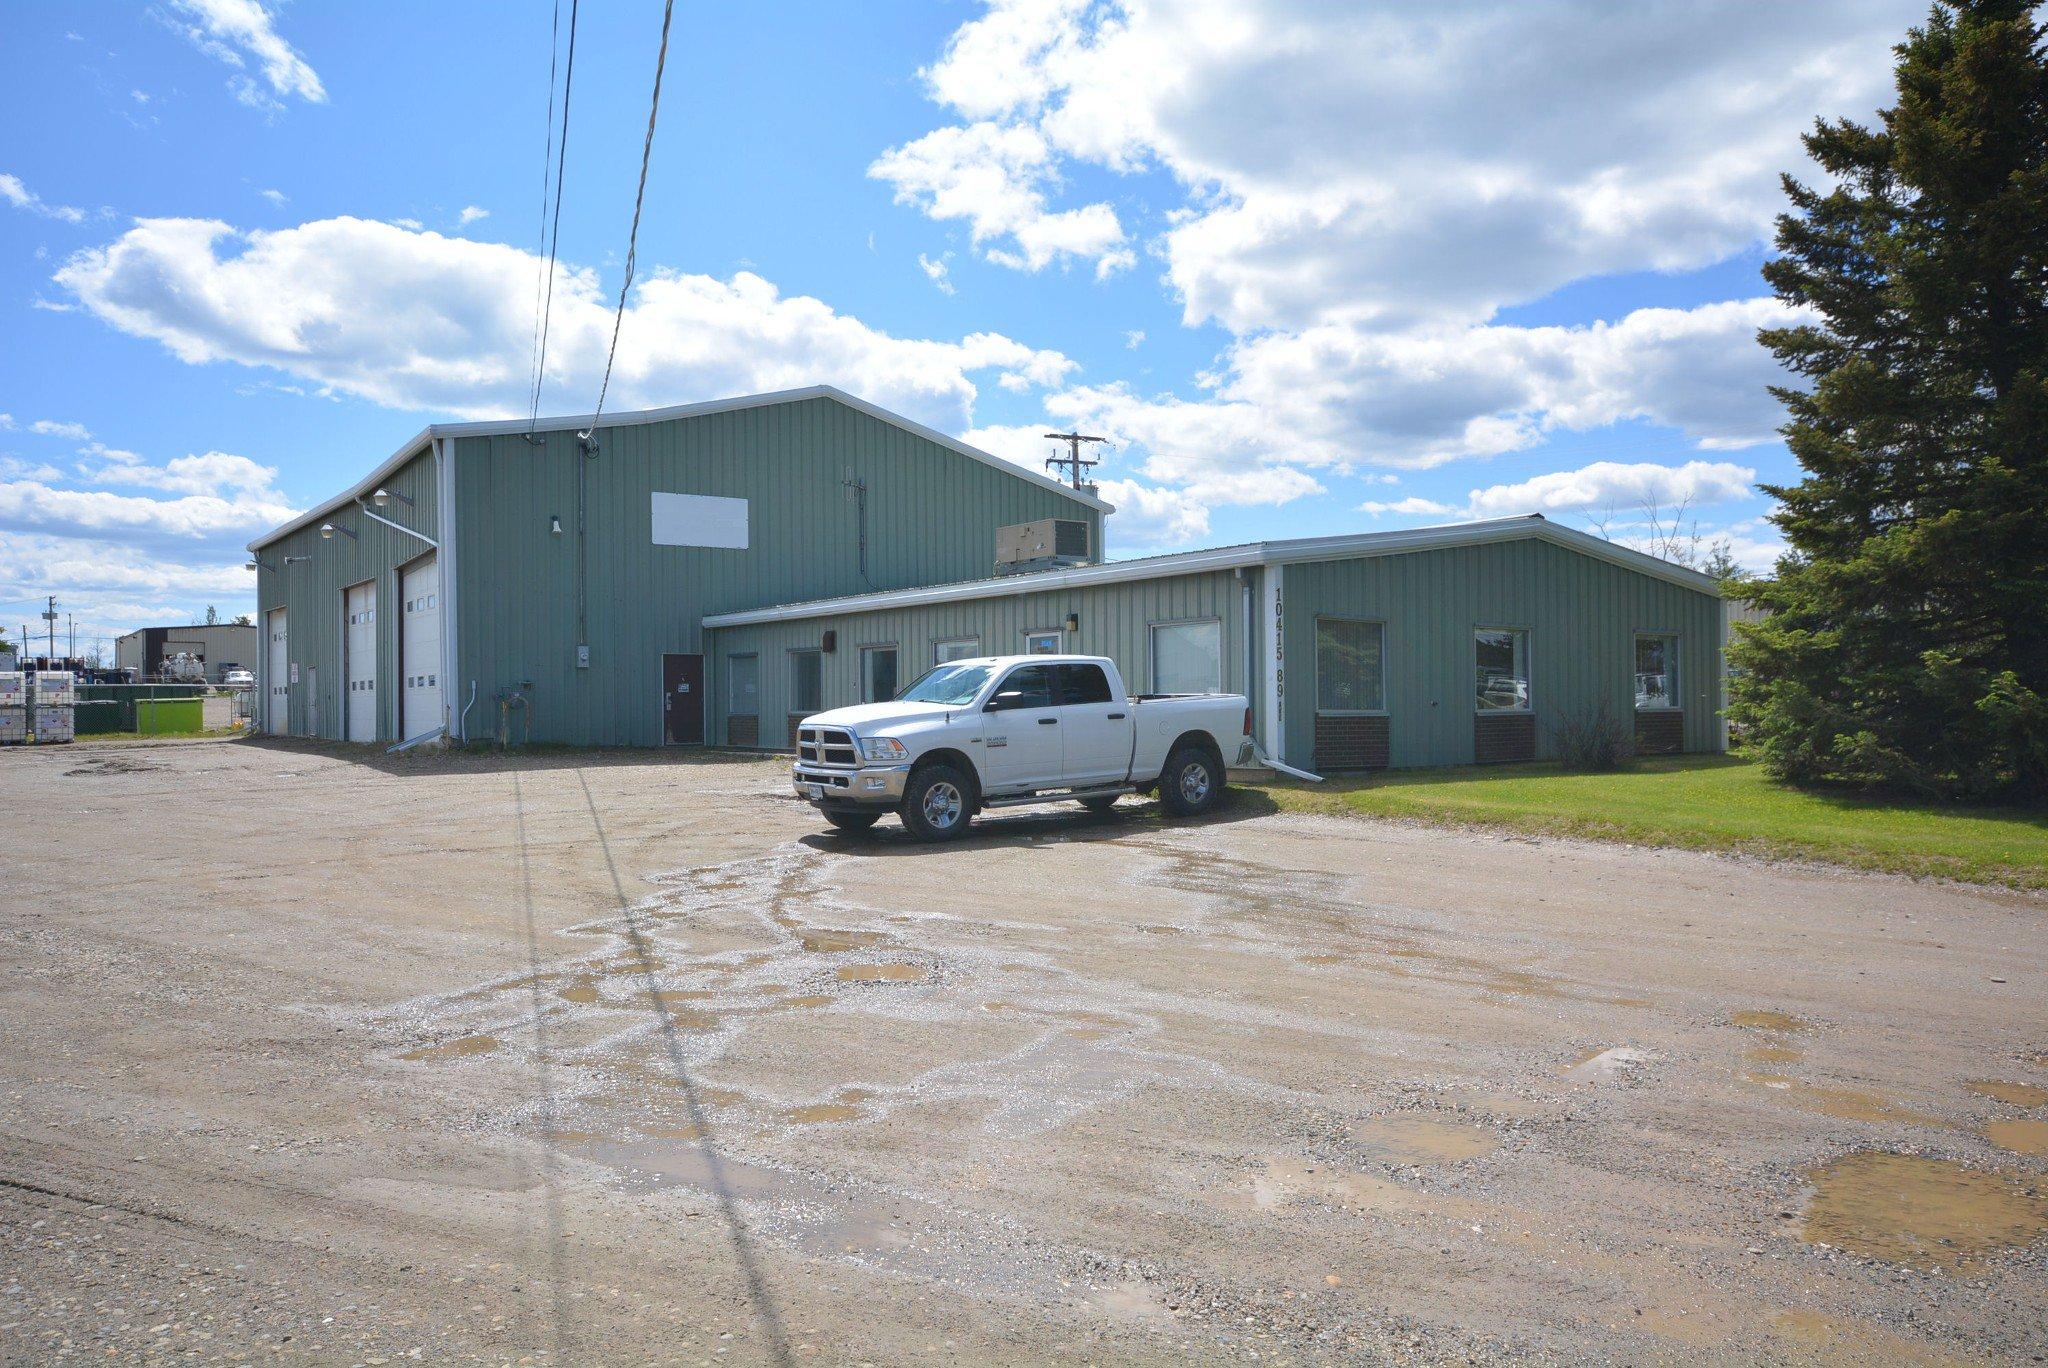 Main Photo: 10415 89 Avenue in Fort St. John: Fort St. John - City SW Industrial for sale (Fort St. John (Zone 60))